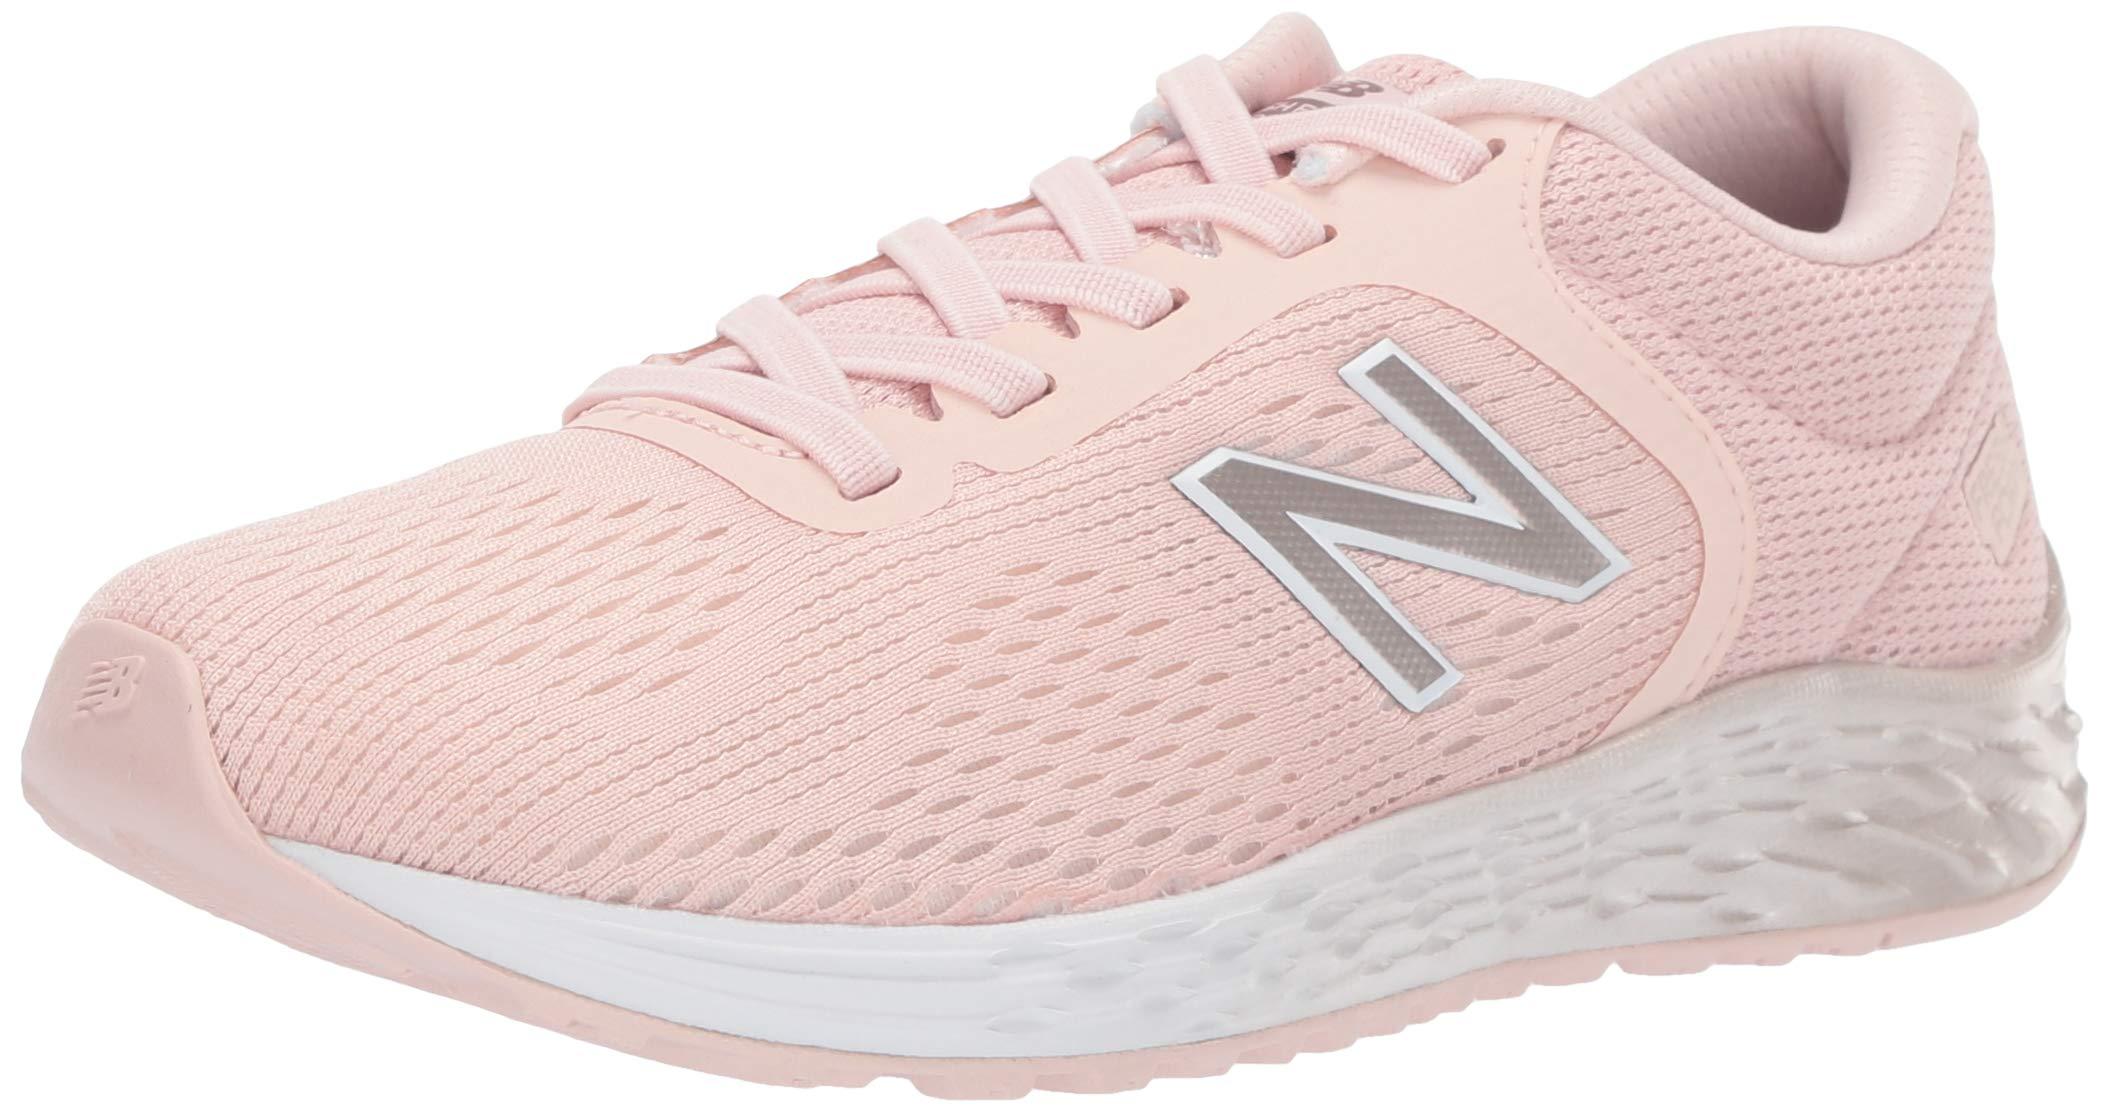 New Balance Girls' Arishi V2 Running Shoe, Oyster Pink Mist, 10 M US Toddler